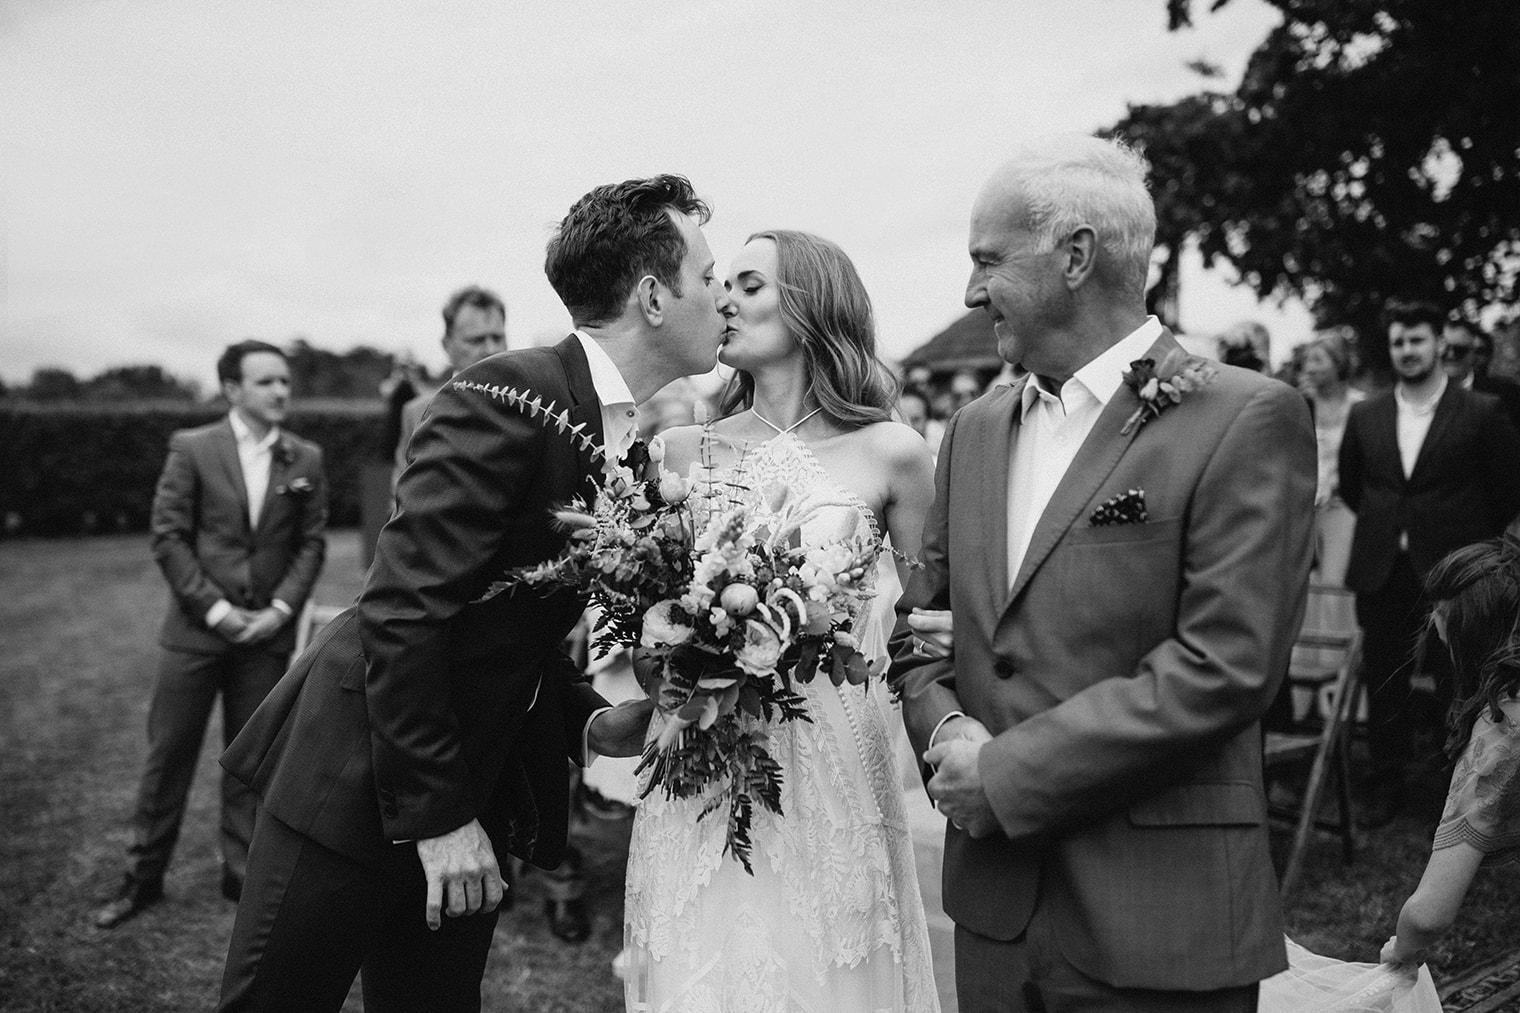 Groom kissing bride during outdoor wedding in essex